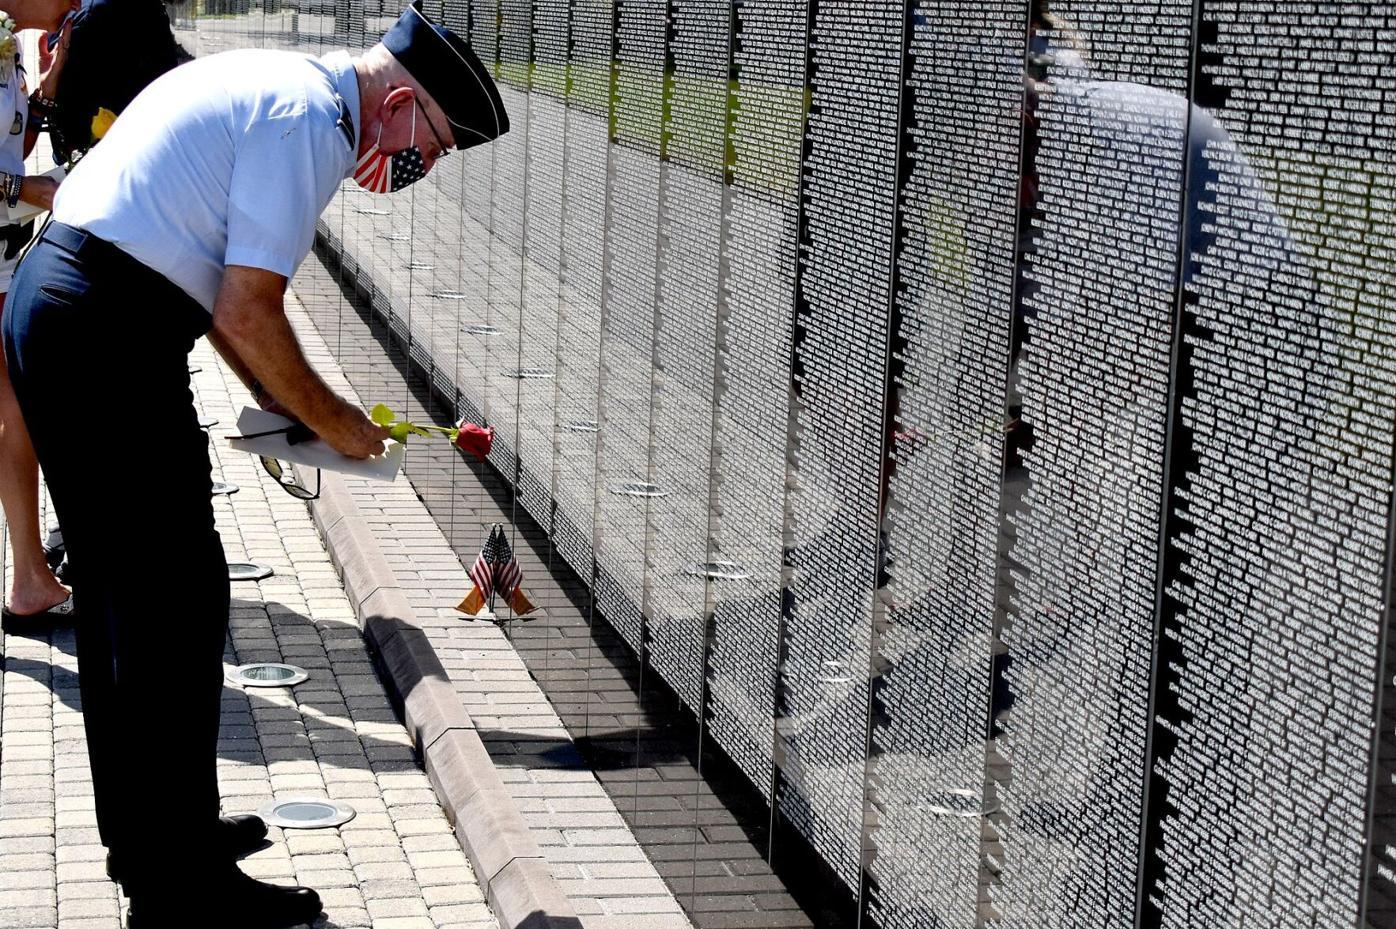 Veterans, Gold Star families honored at Veterans Park